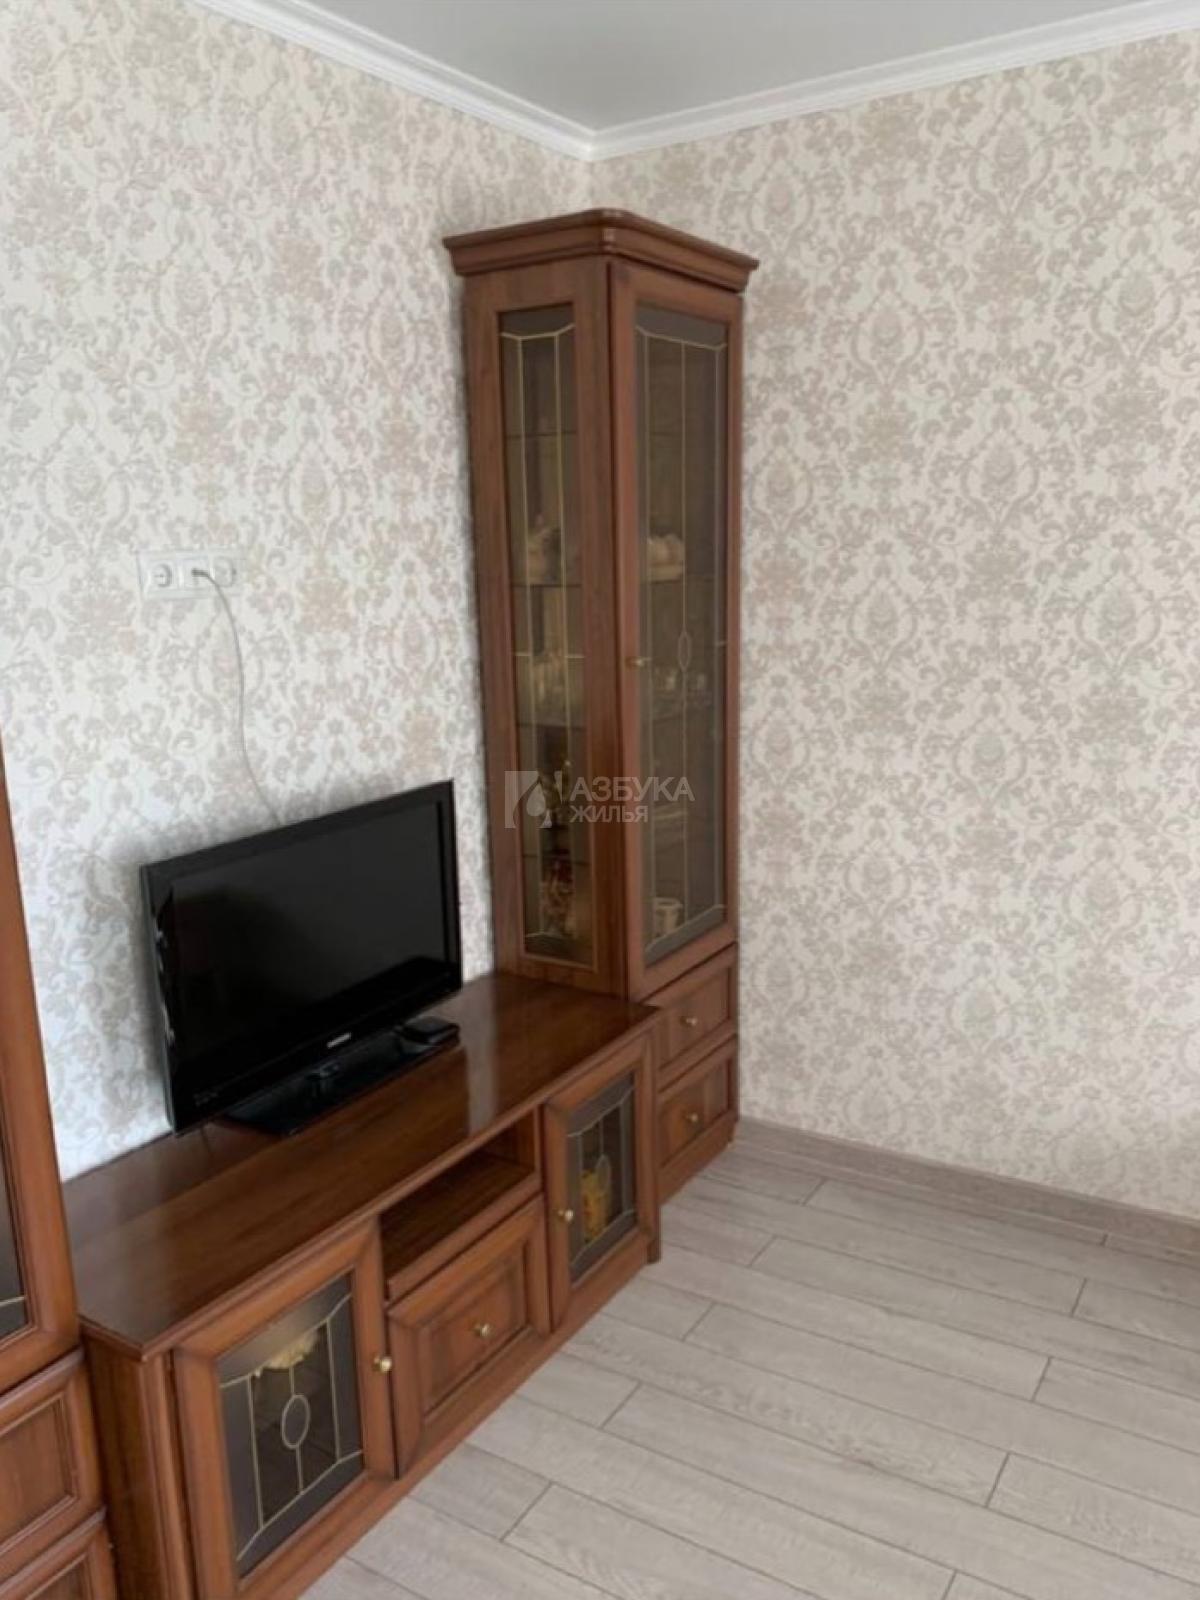 Фото №3 - 2-комнатная квартира, Люберцы, Камова улица 9 корпус 2, метро Некрасовка